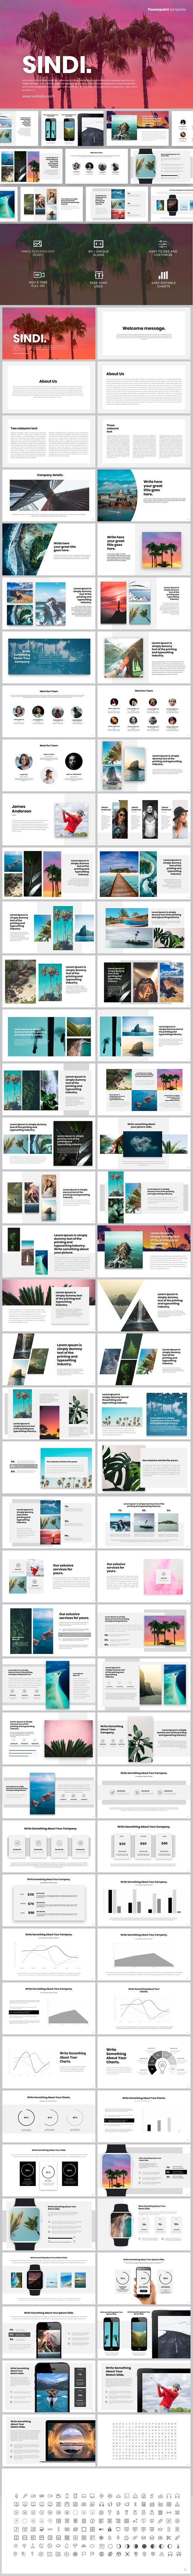 Sindi Powerpoint Template - PowerPoint Templates Presentation Templates